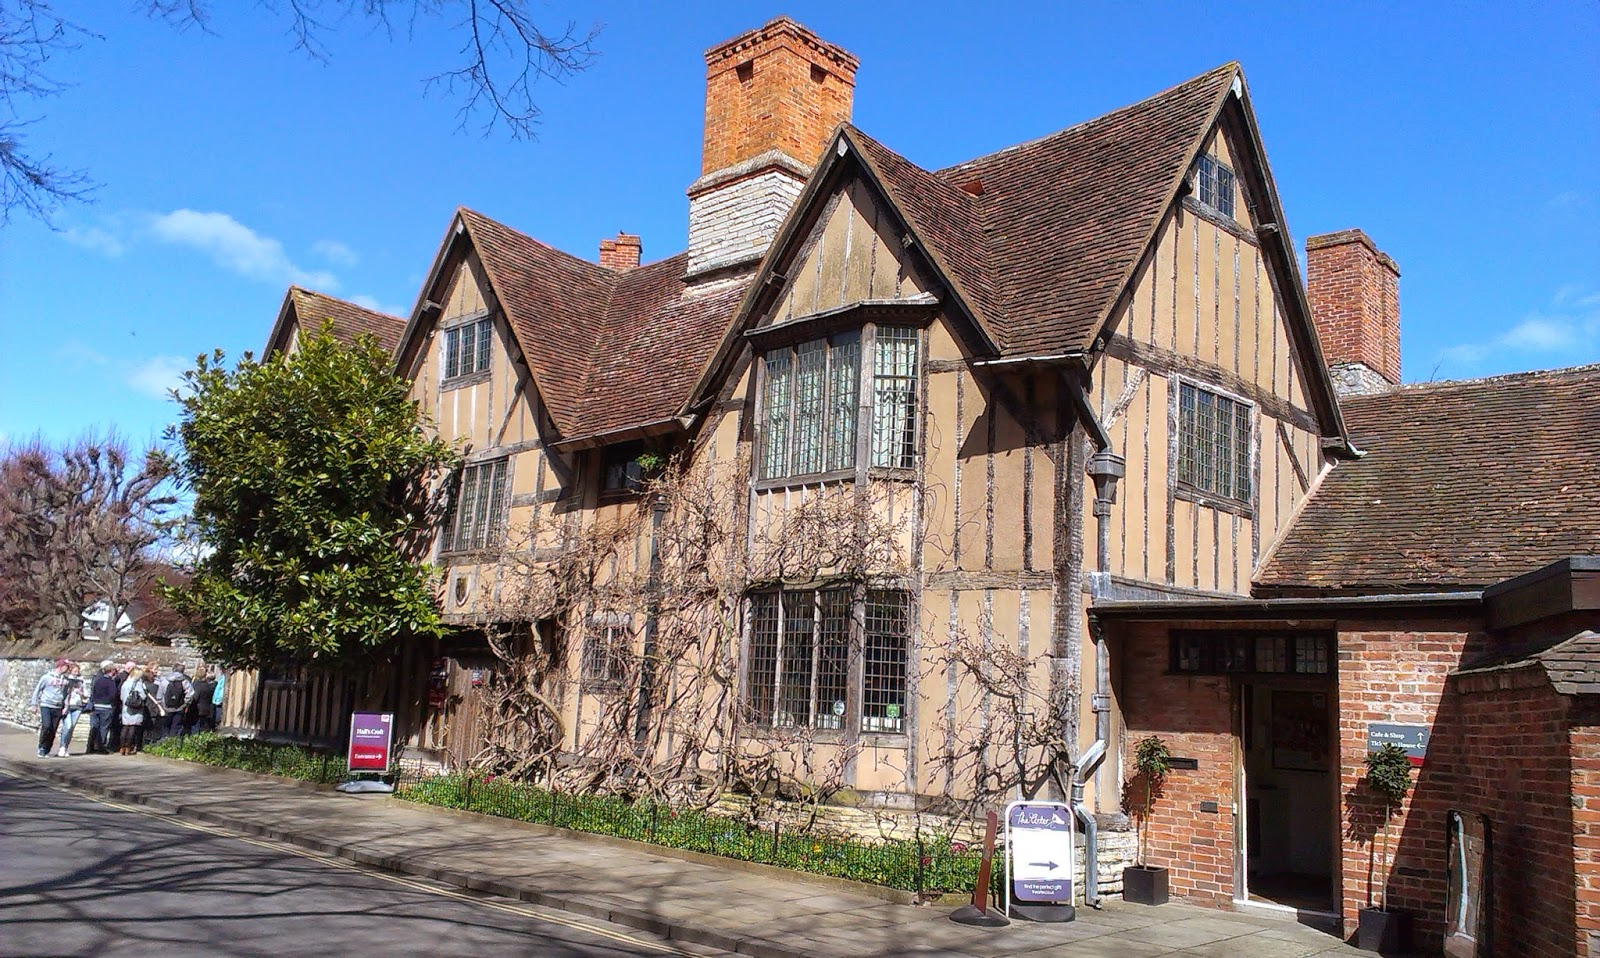 Hall's Croft, Stratford upon Avon